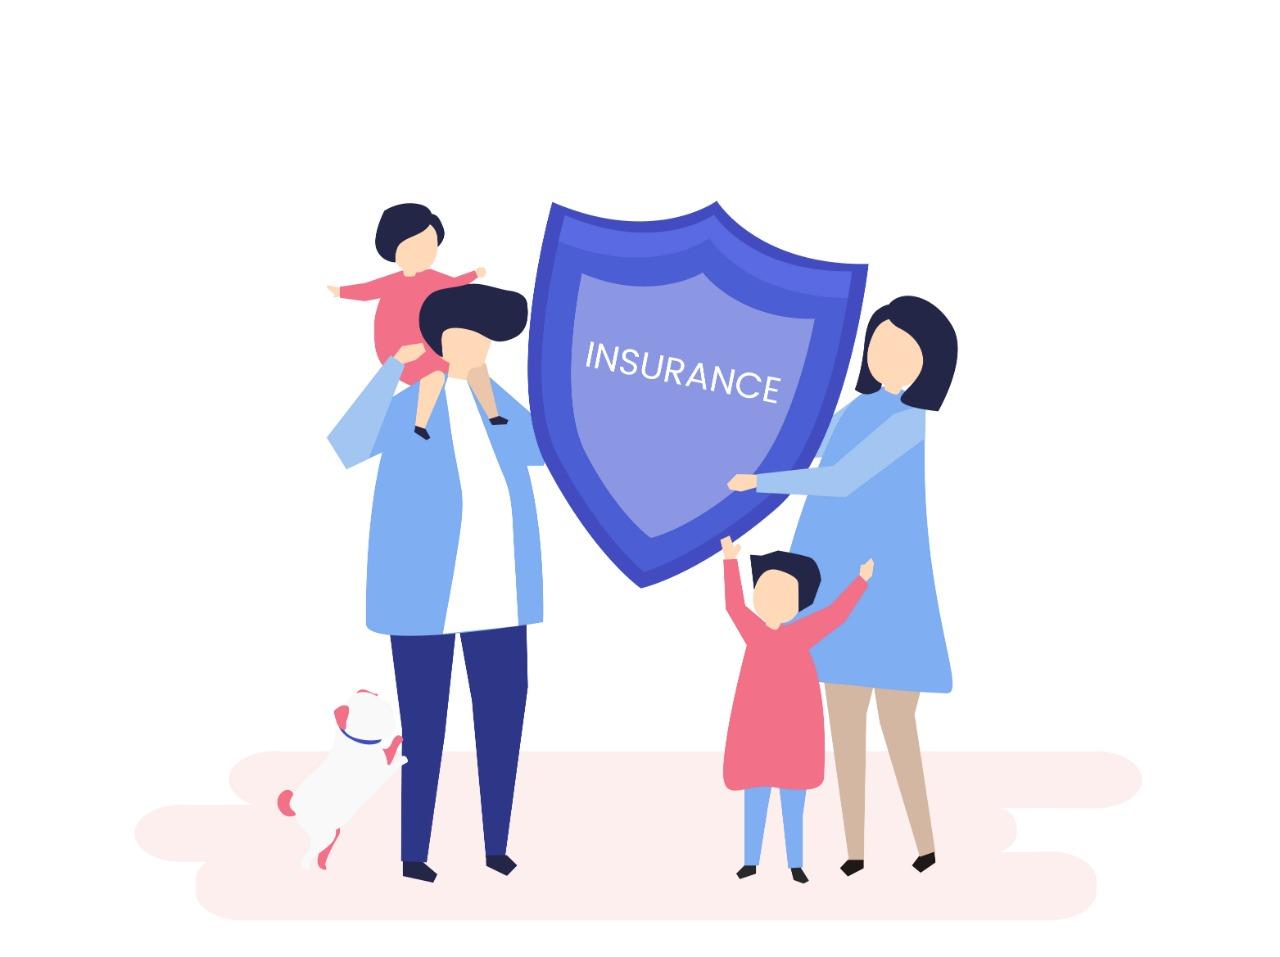 Ilustrasi gambar manfaat perlindungan asuransi